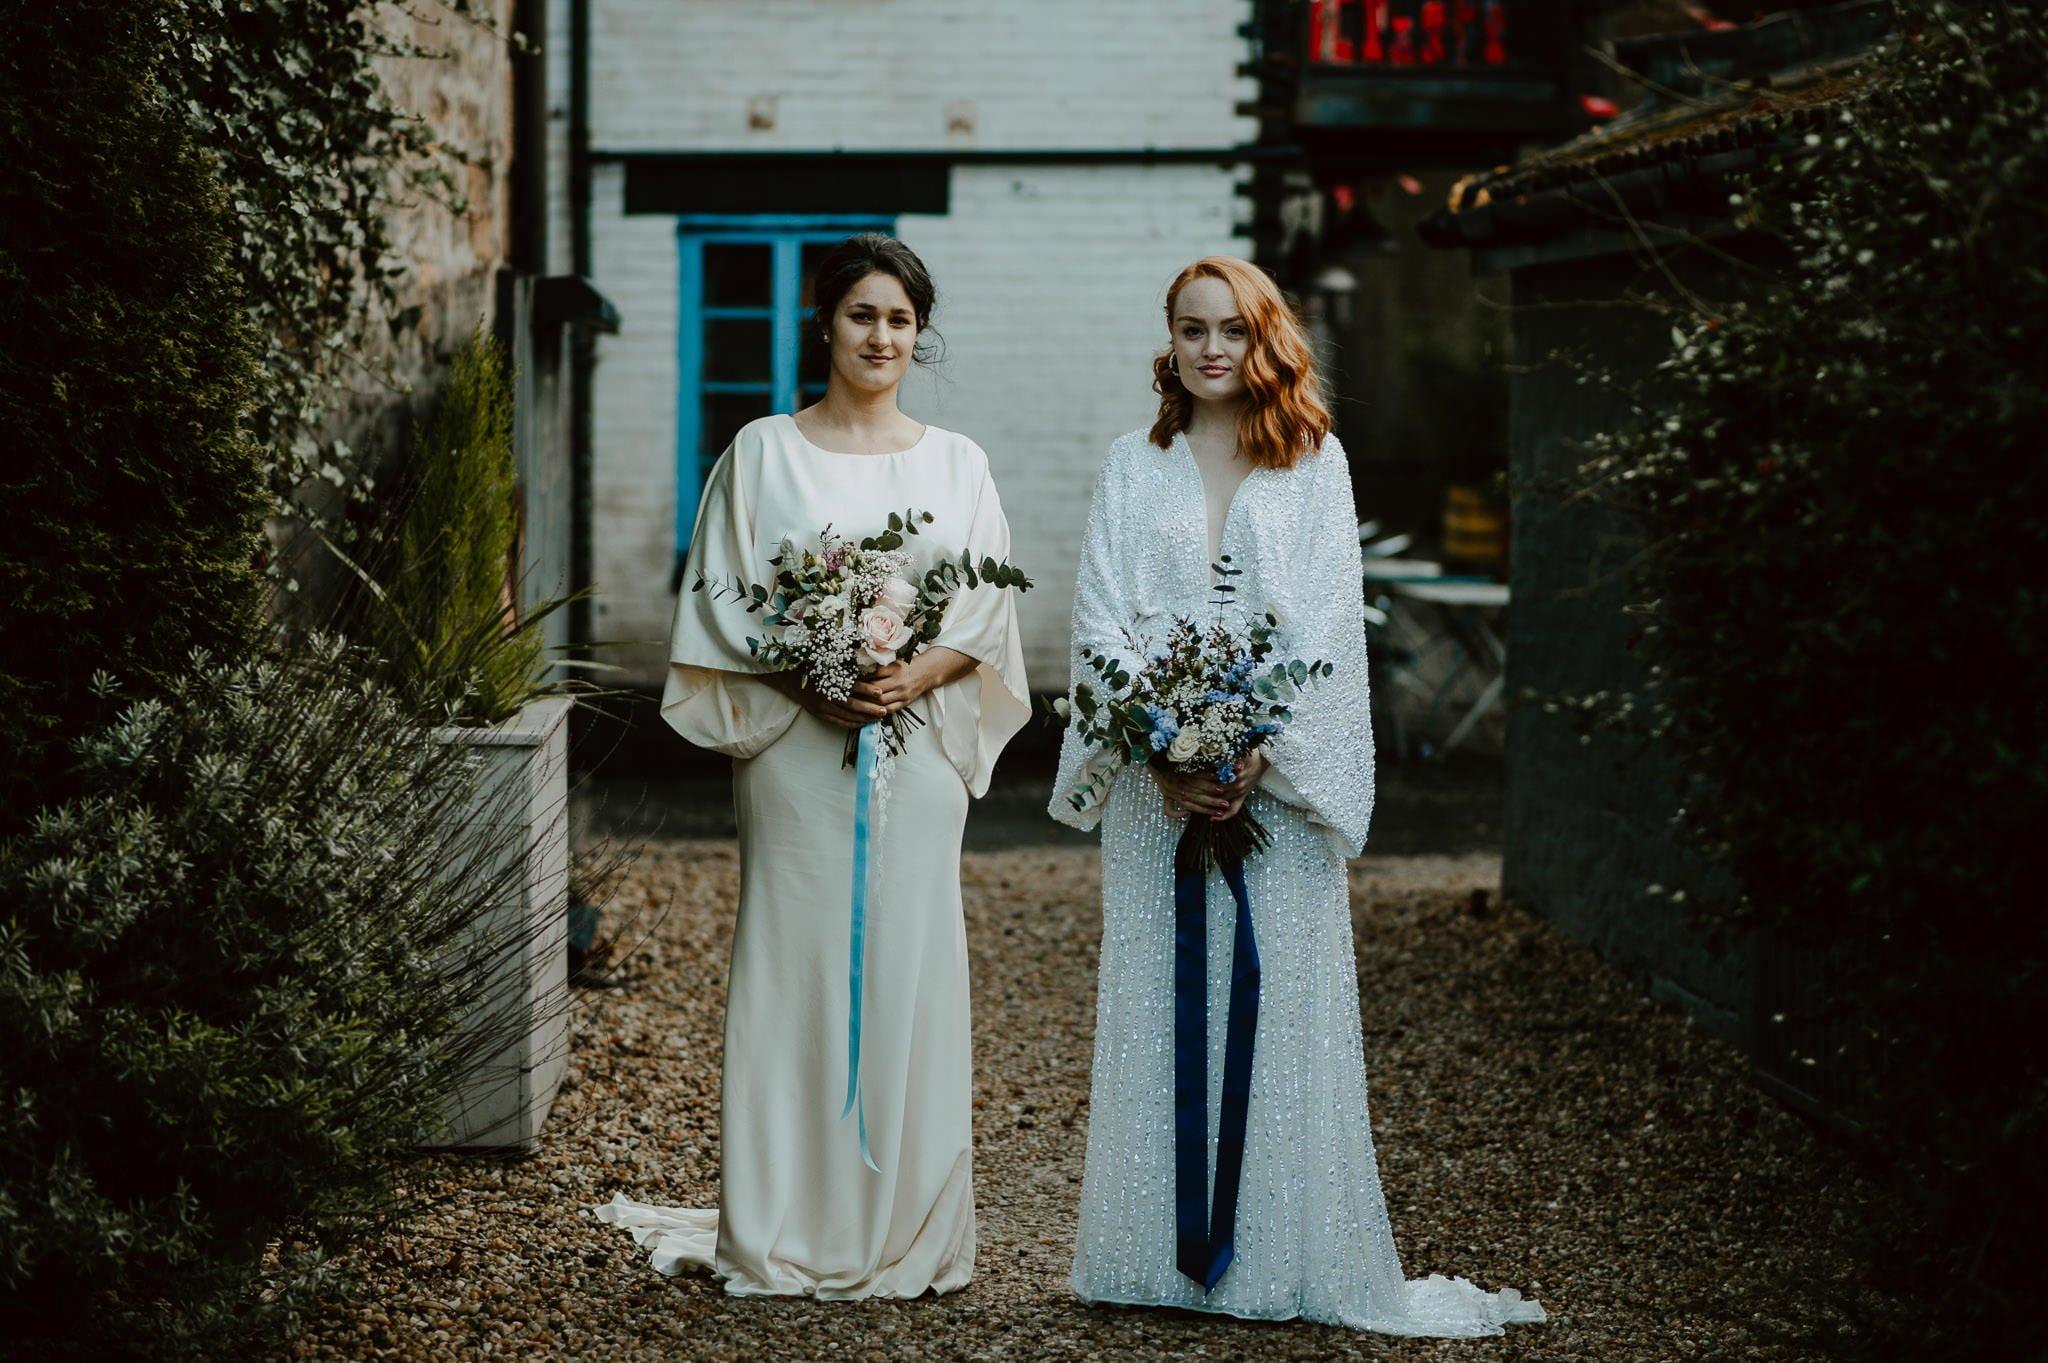 A Dreamy Pre-Raphaelite Wedding at the Bothy in Glasgow 16